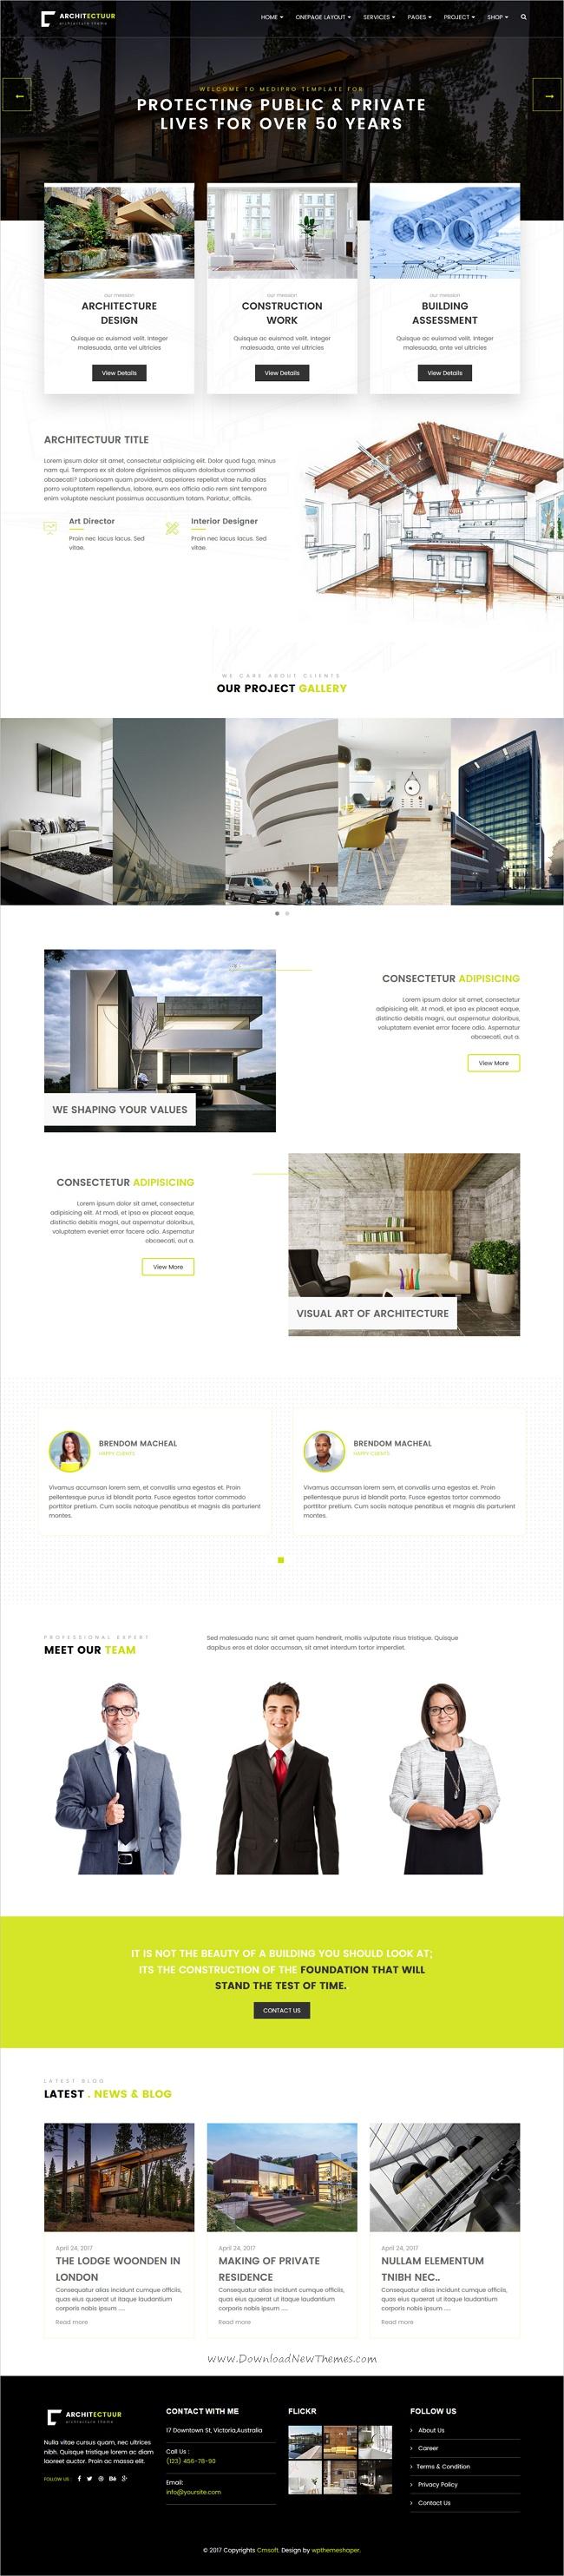 Architectuur Interior Design Decor Architecture Business HTML